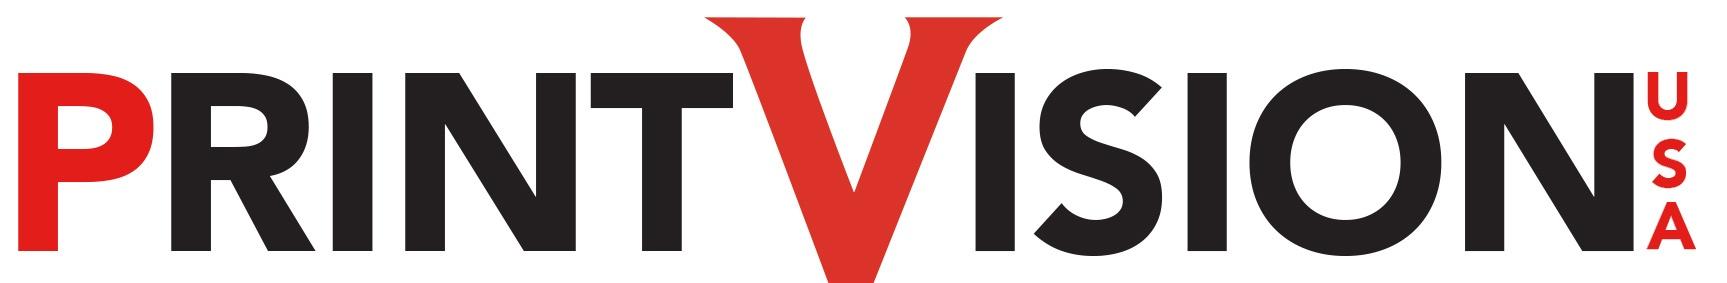 PrintVision Logo